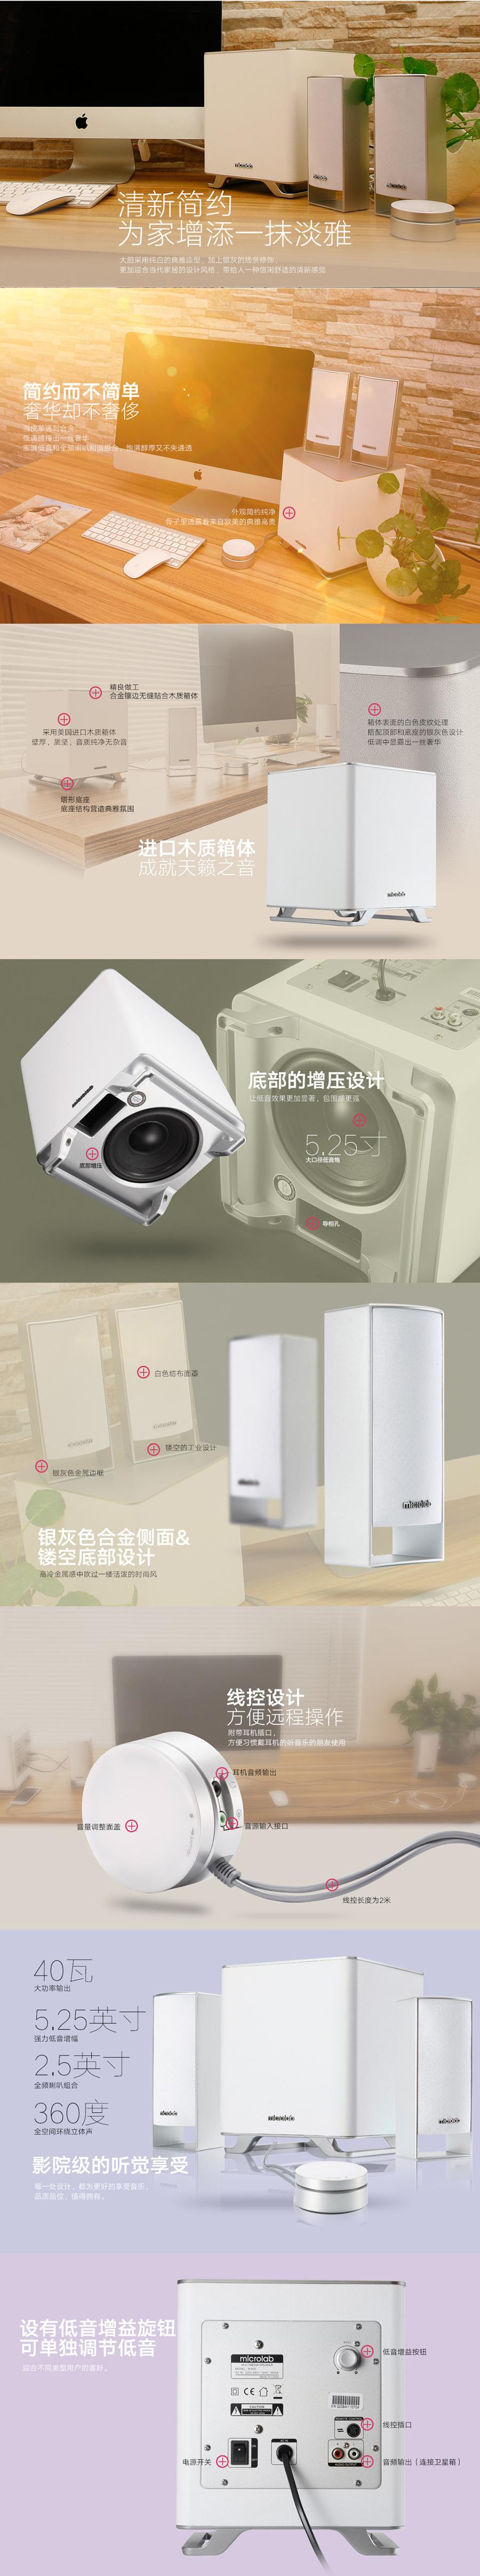 M500 (14)-1.jpg